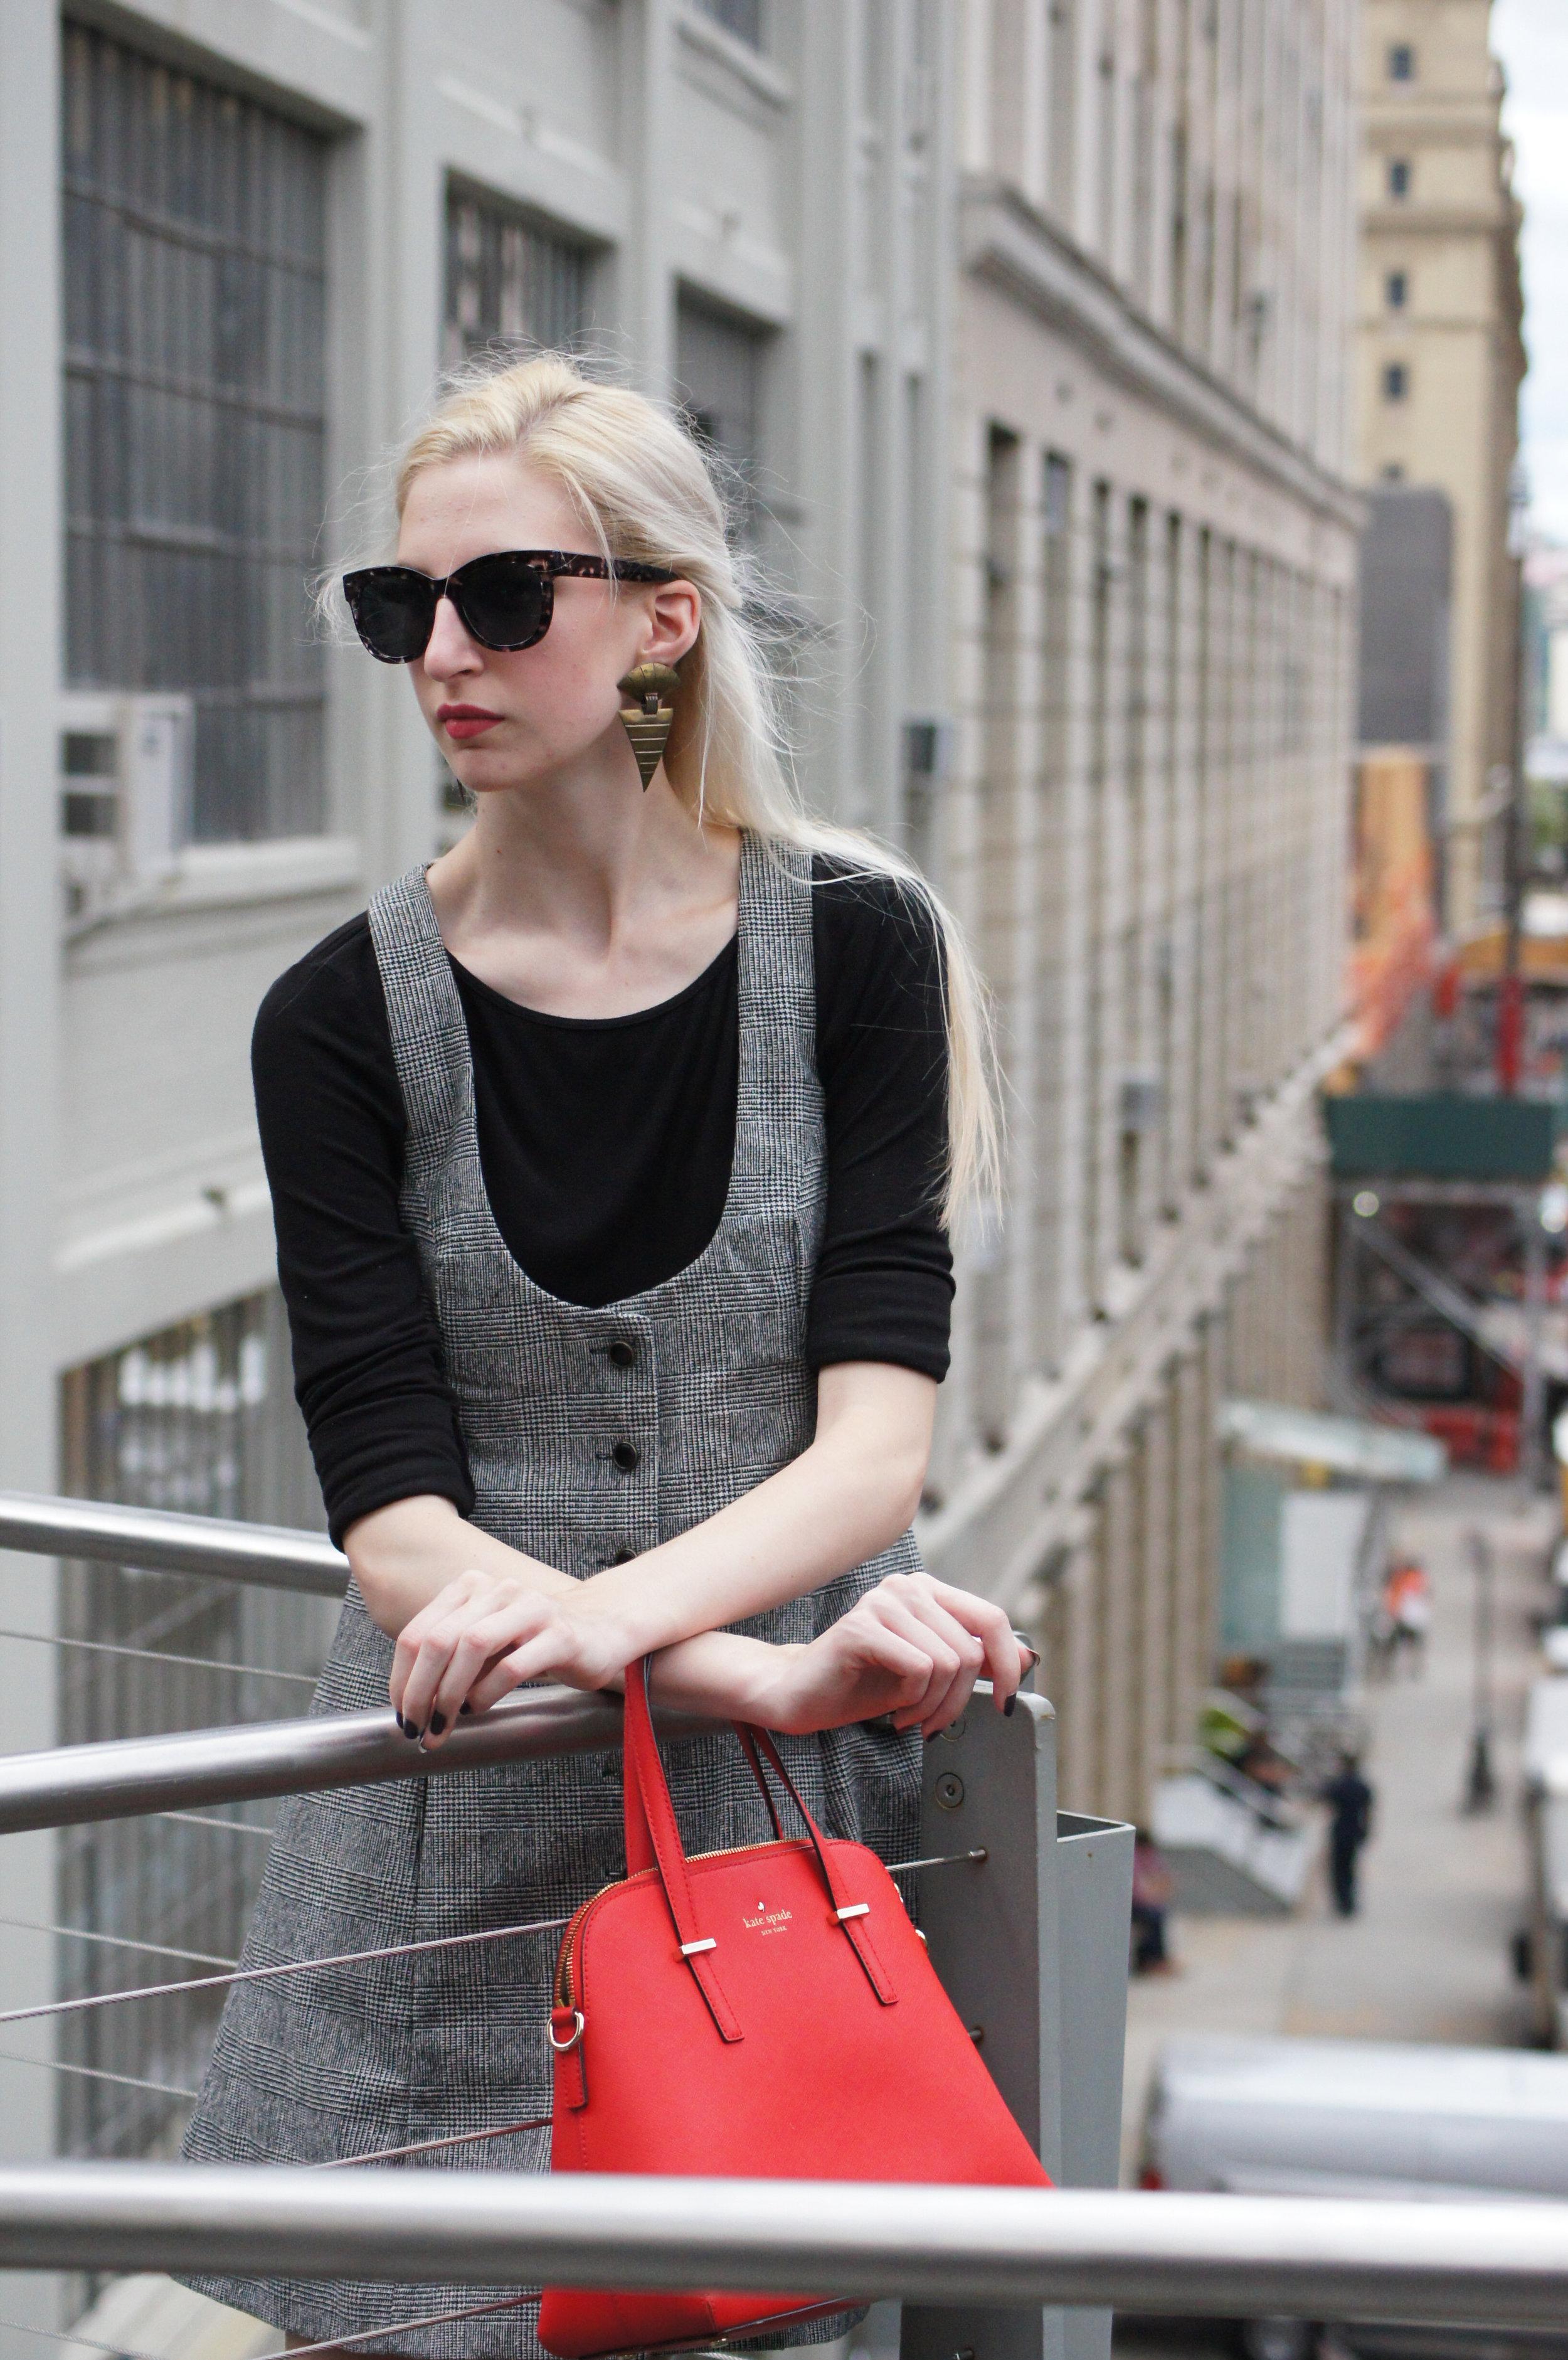 vintage tibi tweed apron dress, loft black longsleeve, Next black heeled ankle boots, kate spade cedar street maise, vintage earrings, loft audrey hepburn sunglasses - Highline Park New York City